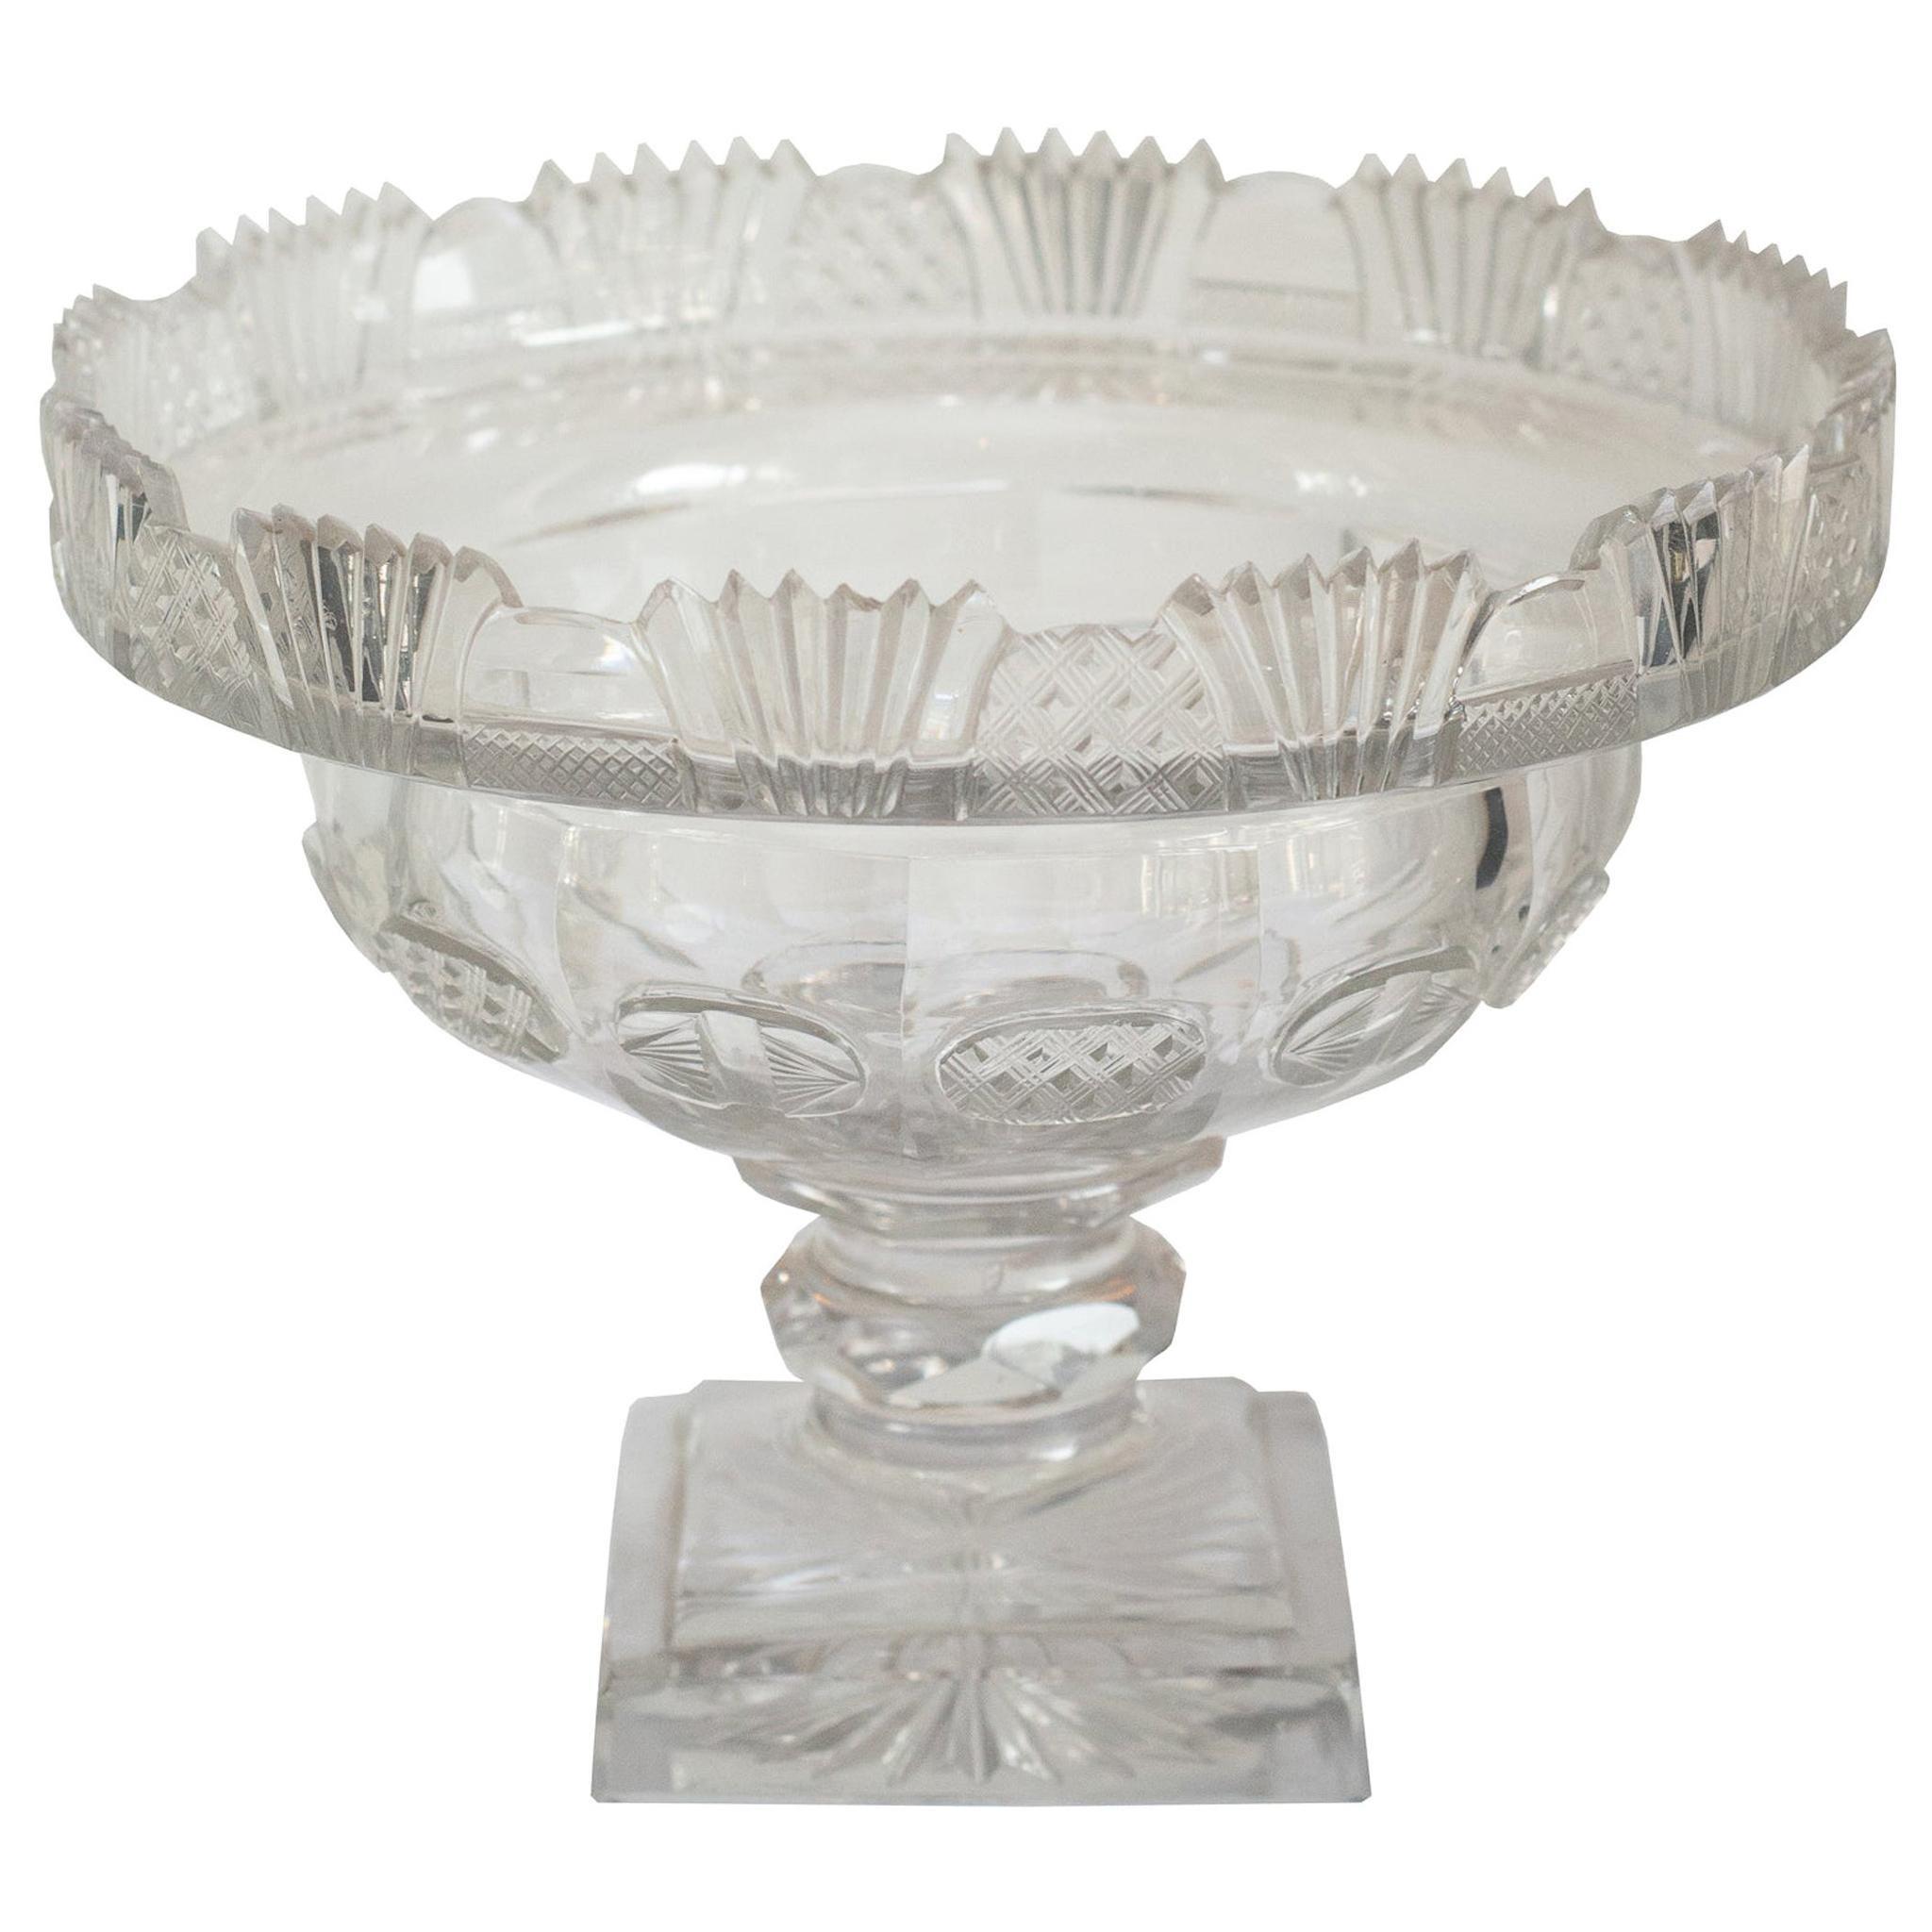 Antique Irish Small Clear Cut Crystal Bowl